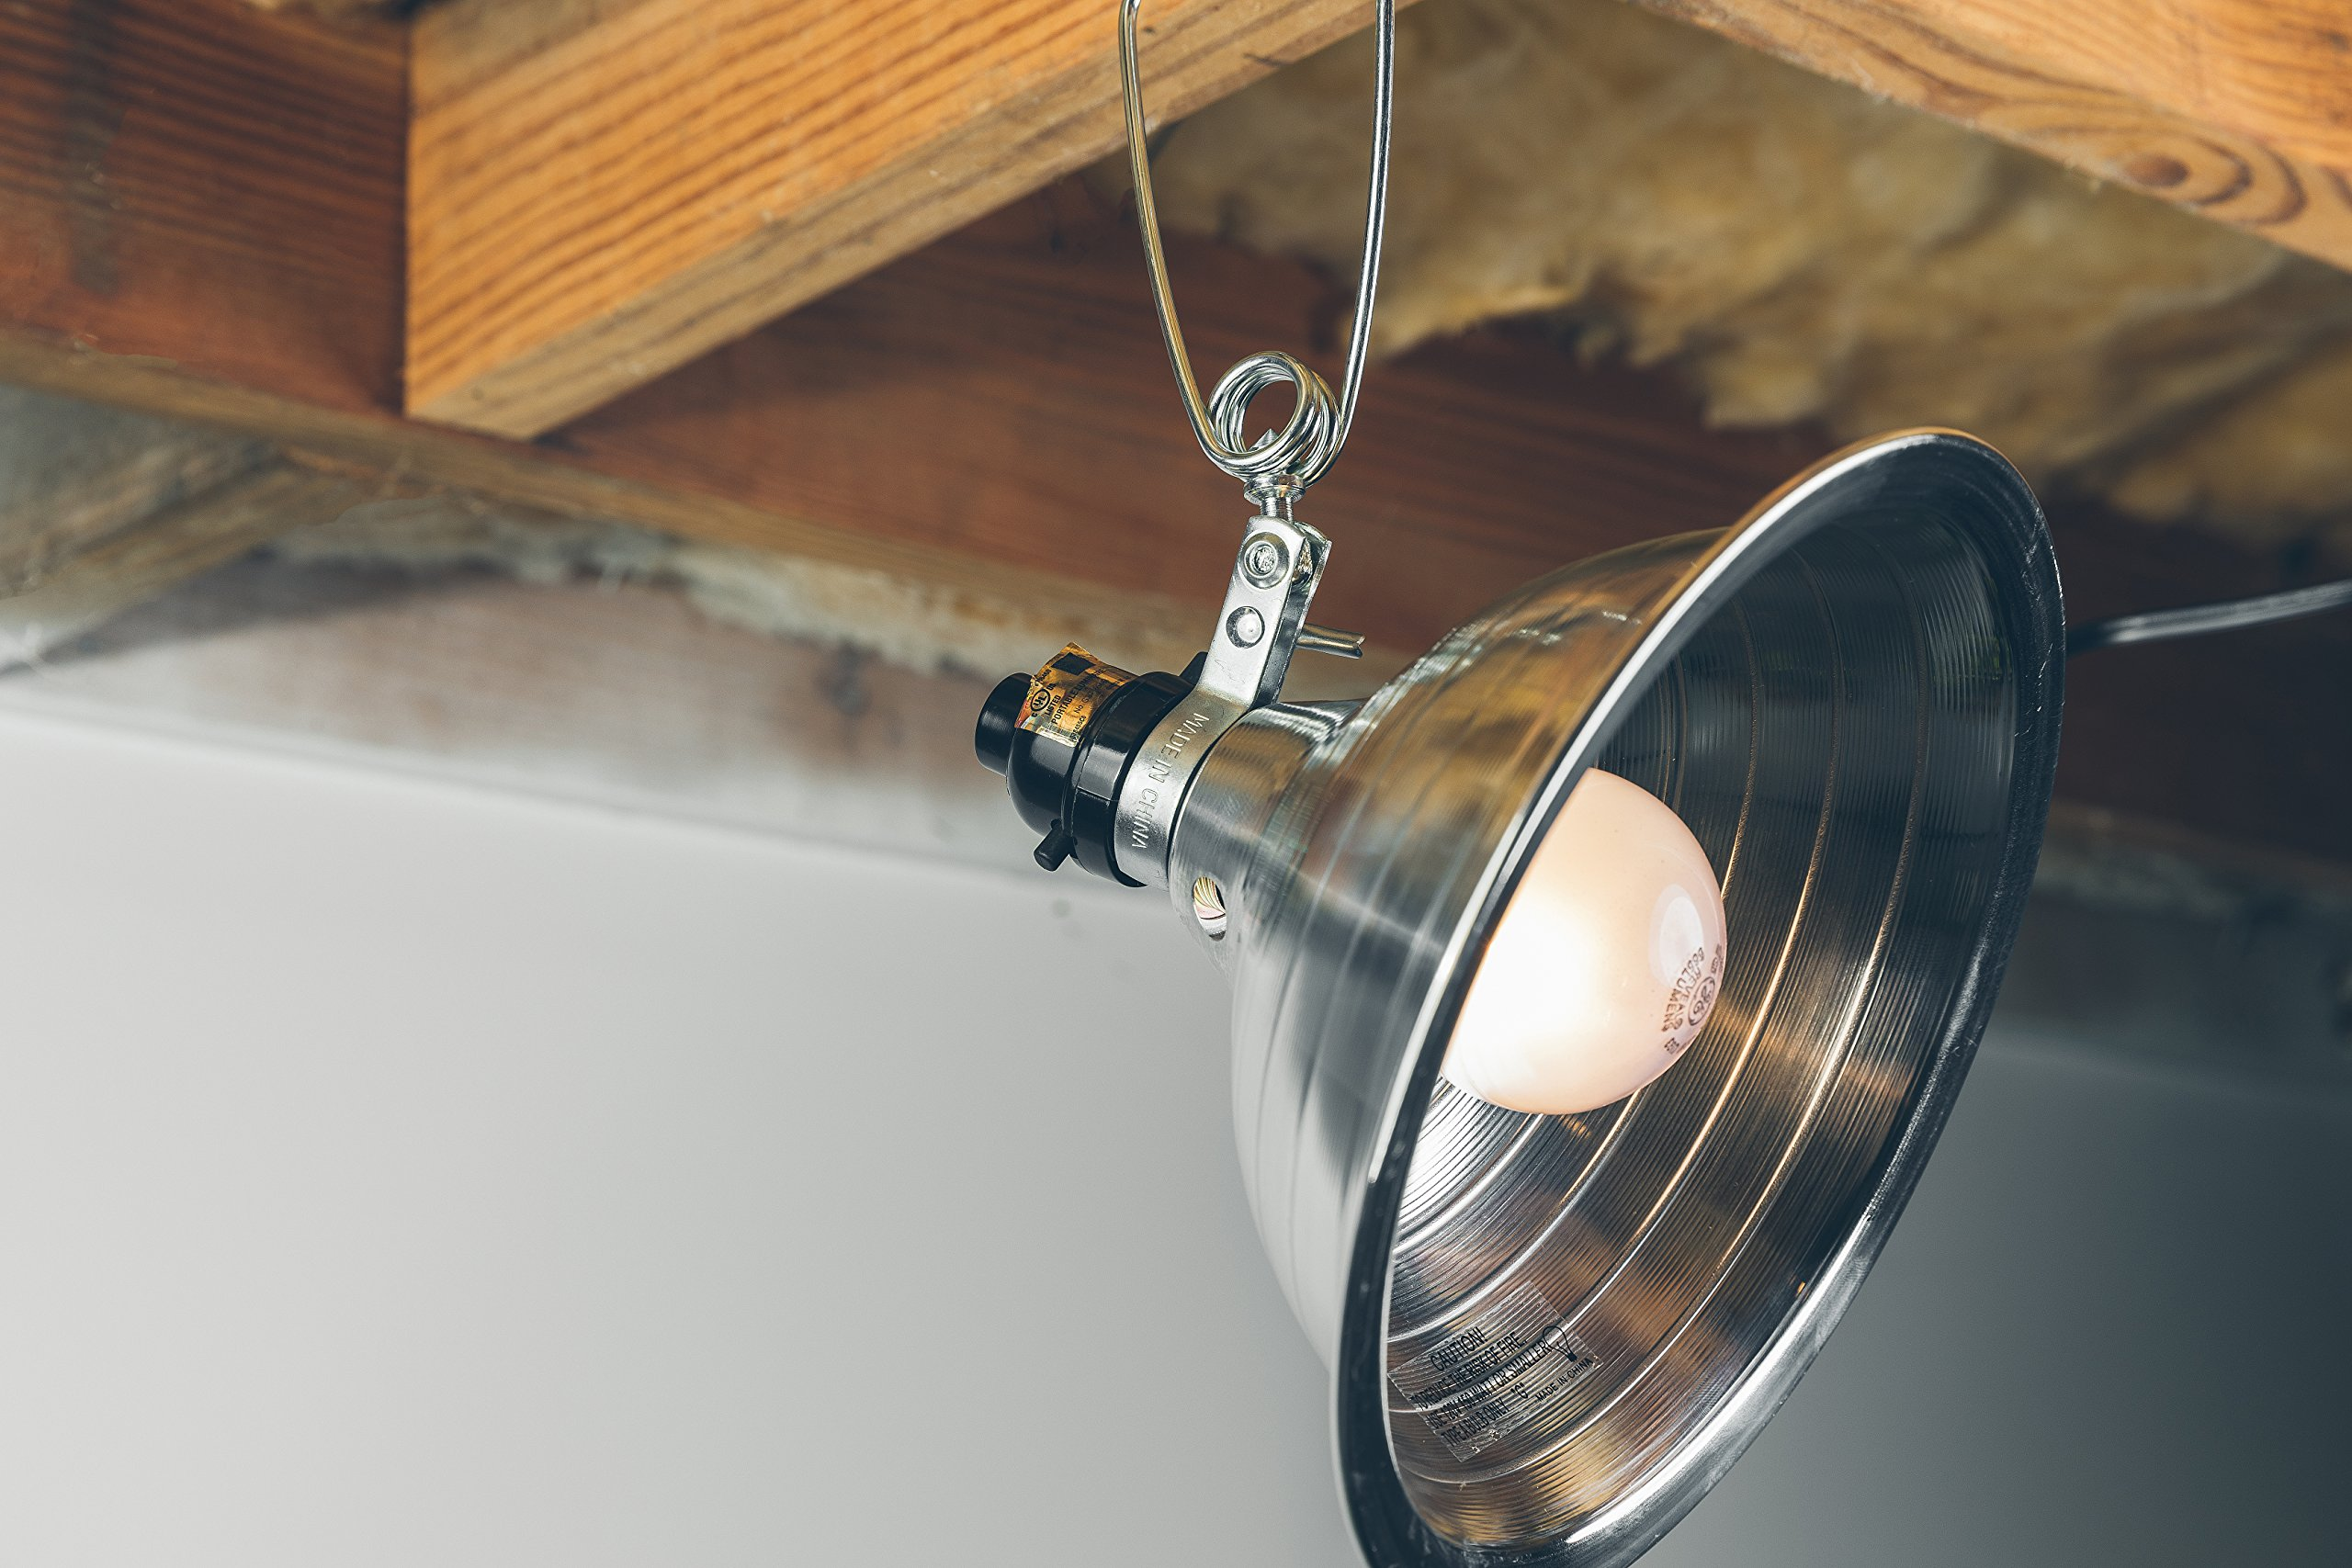 clip neck beautiful black clamp on tutti darealash of desk lamp awesome goose com